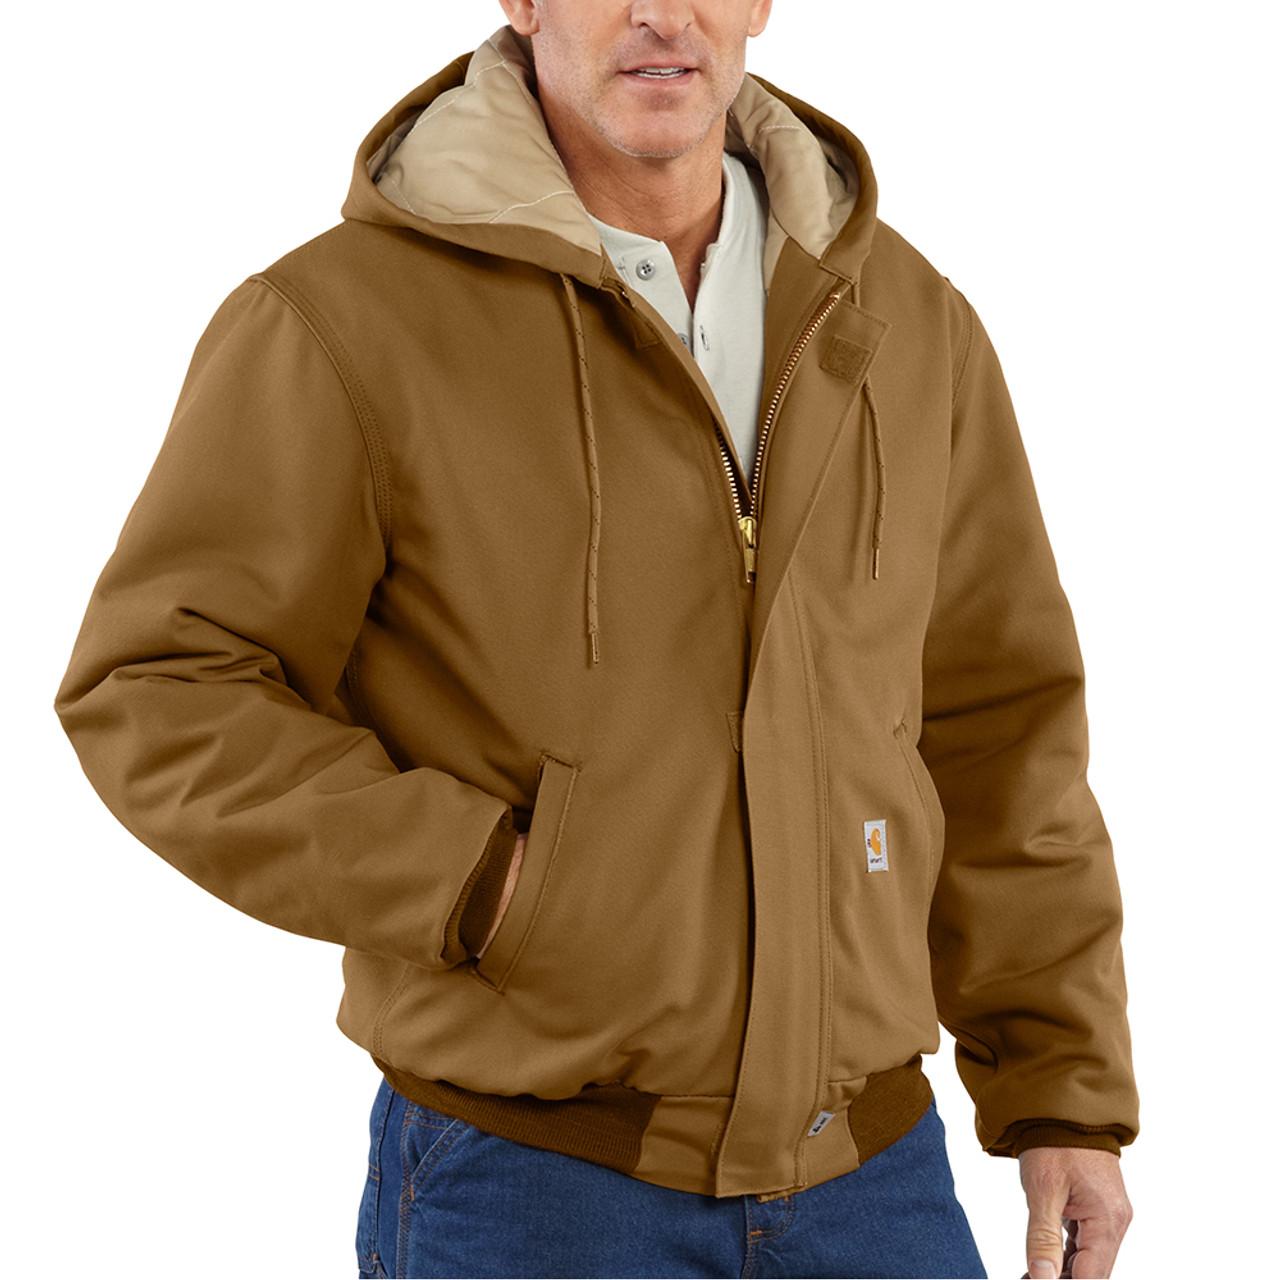 d79e92fd54 ... Carhartt 54 cal/cm2 Men's Flame Resistant Duck Active Jacket - 101621  ...